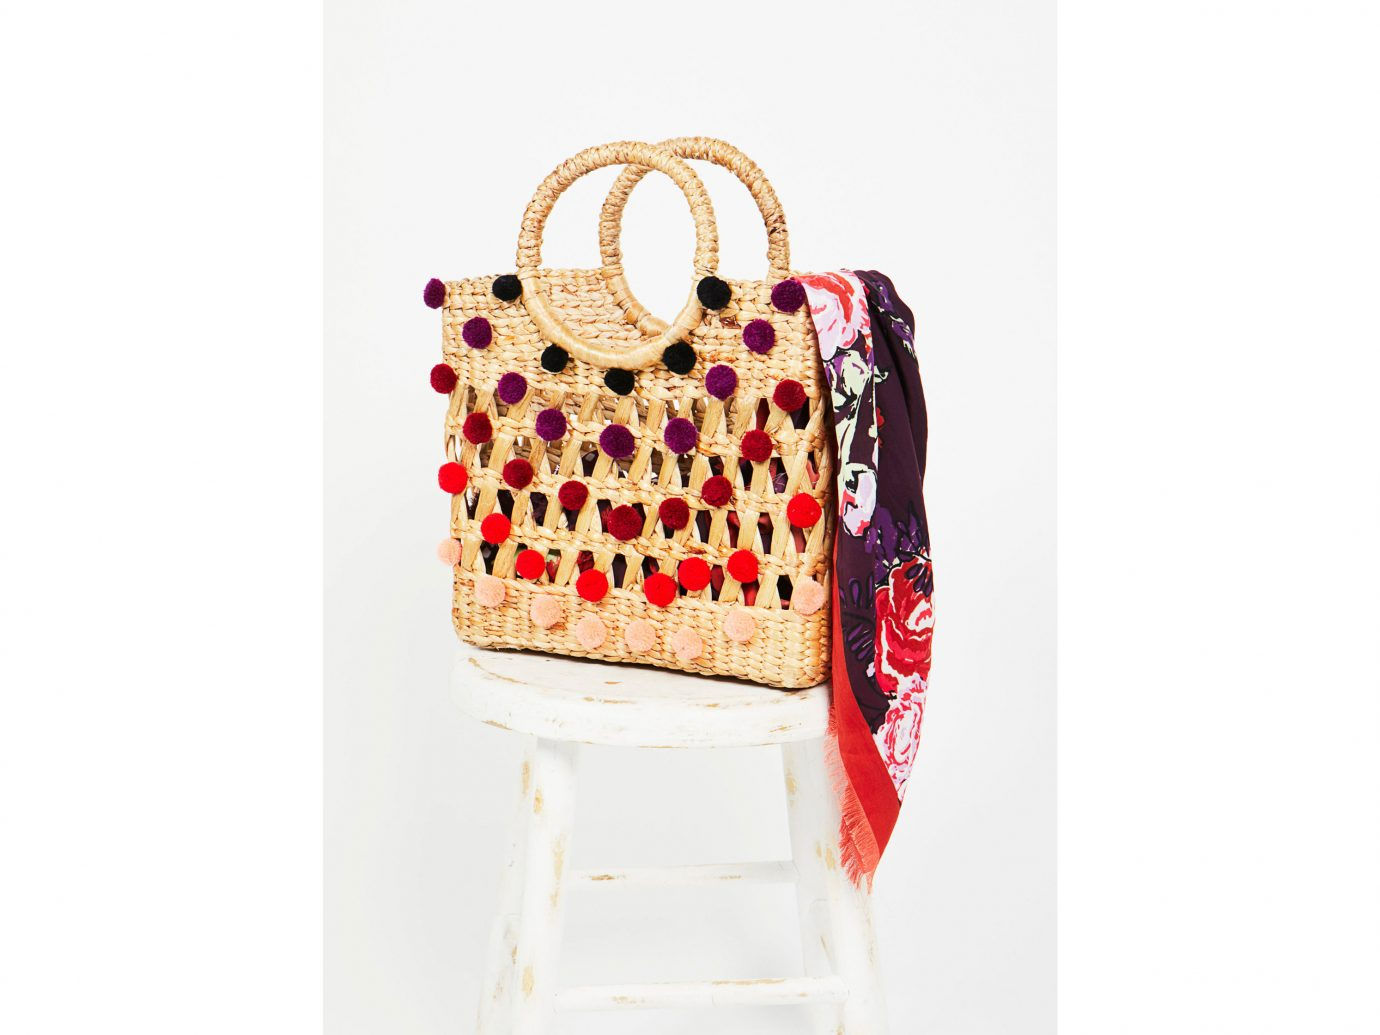 Cruise Travel Style + Design handbag pink fashion accessory pattern bag Design textile